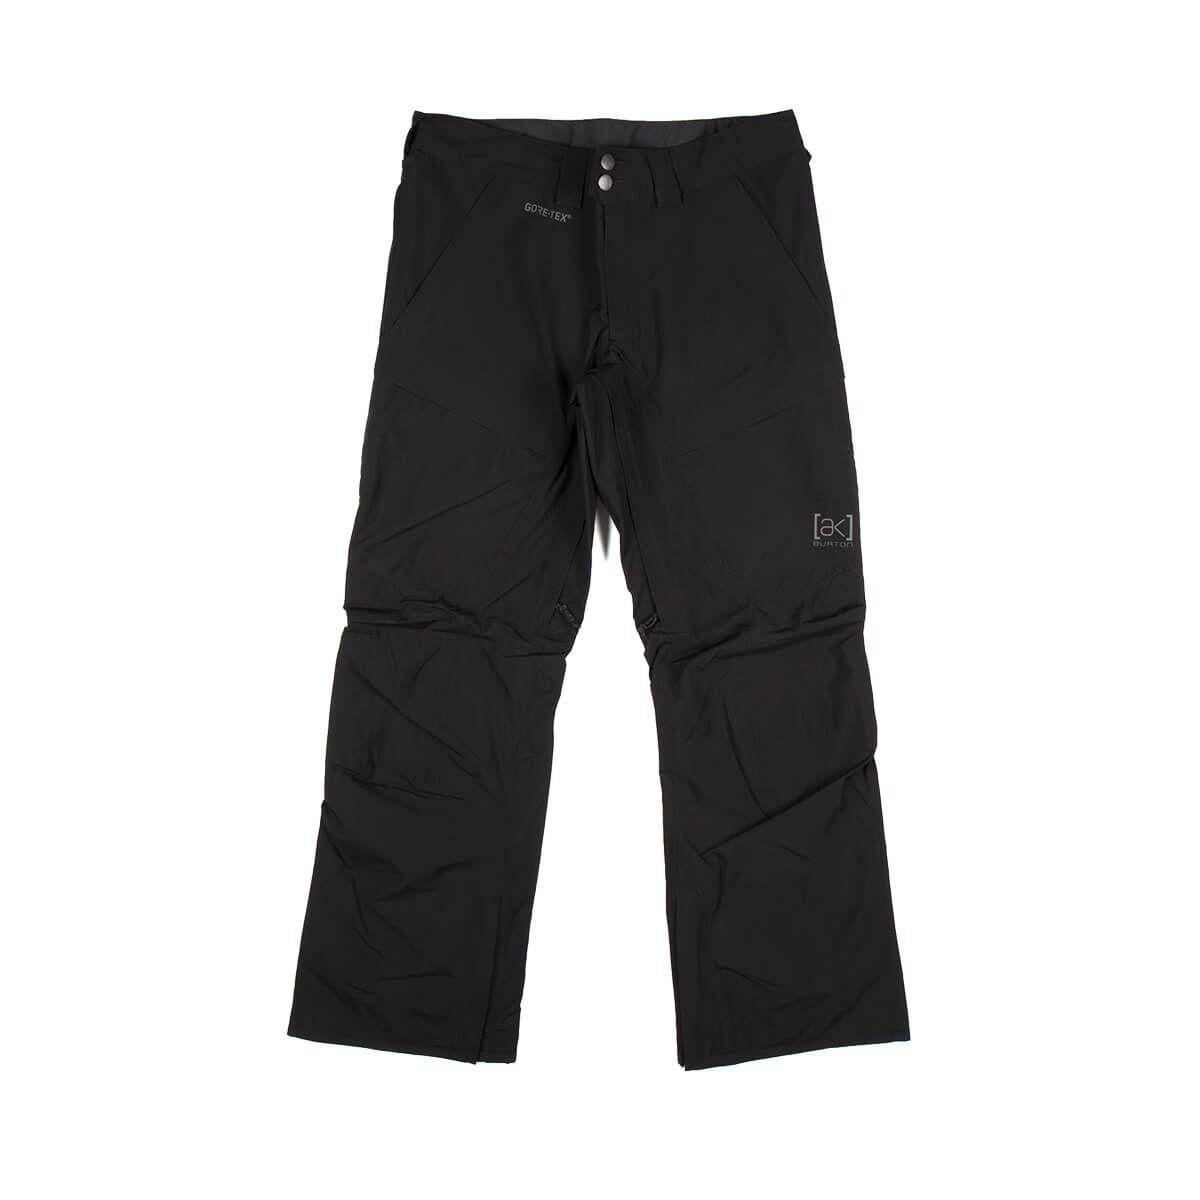 BURTON Goretex Swash Pants in Black